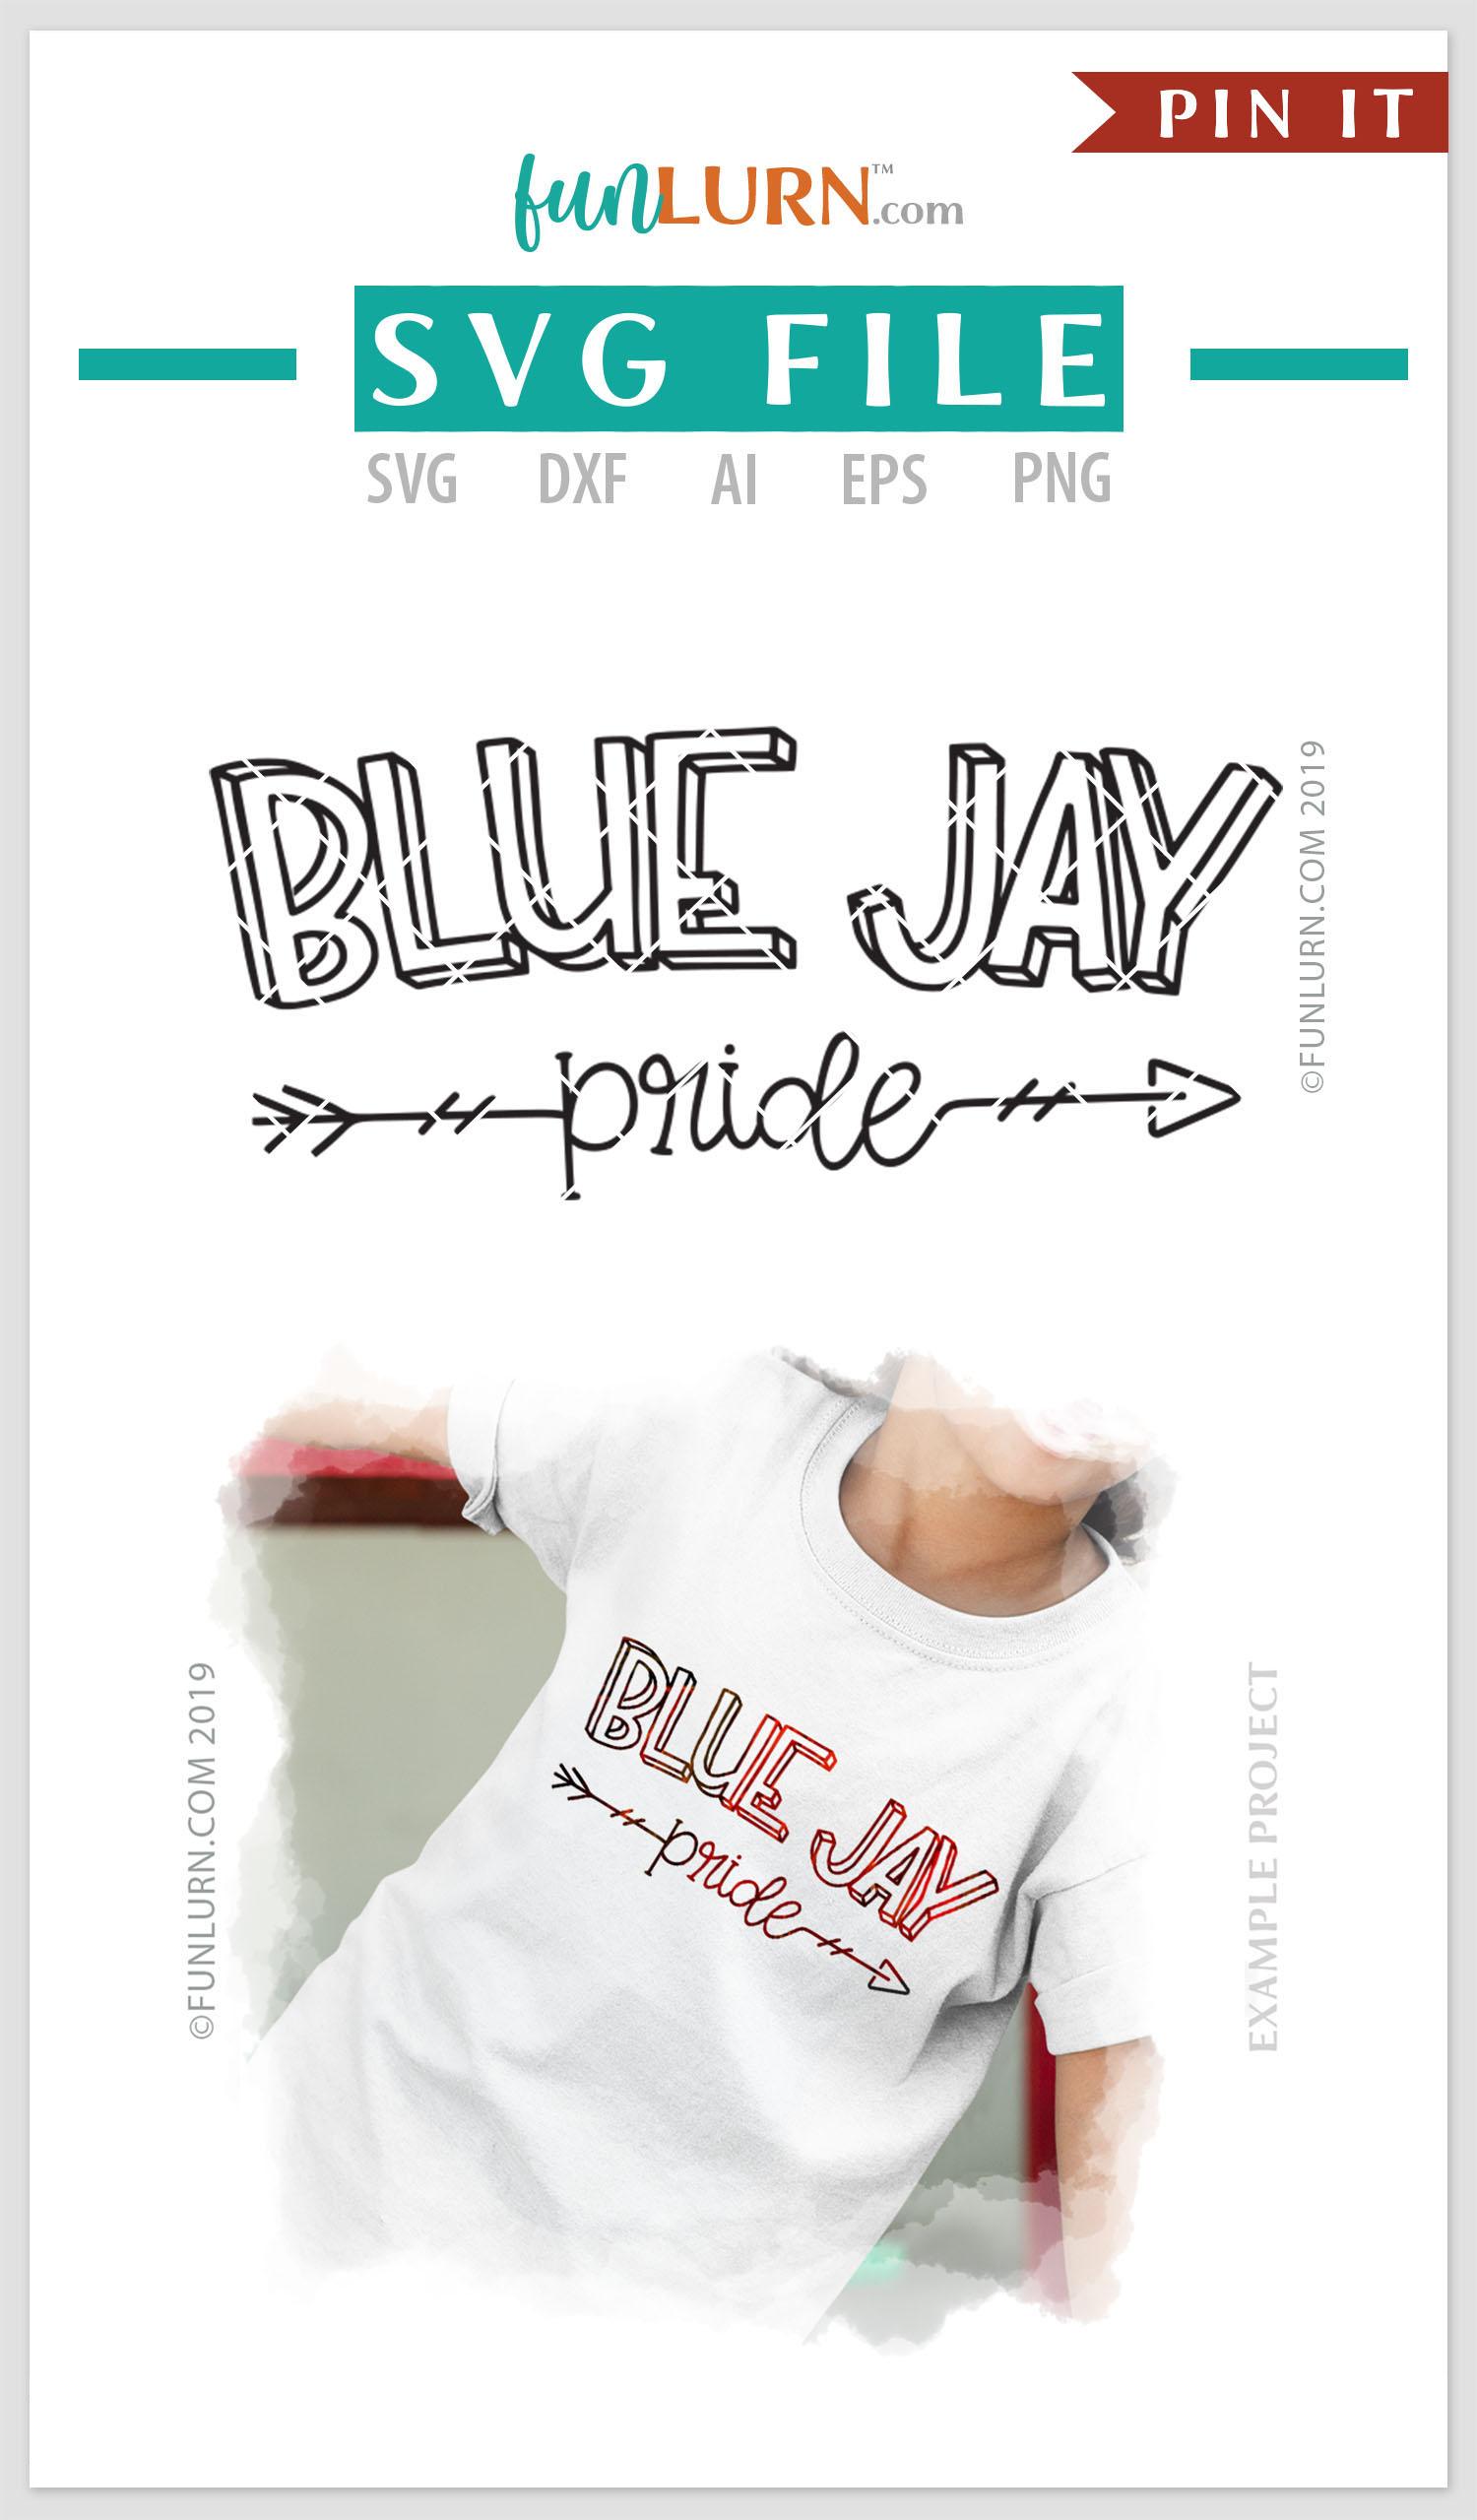 Blue Jay Pride Team SVG Cut File example image 4